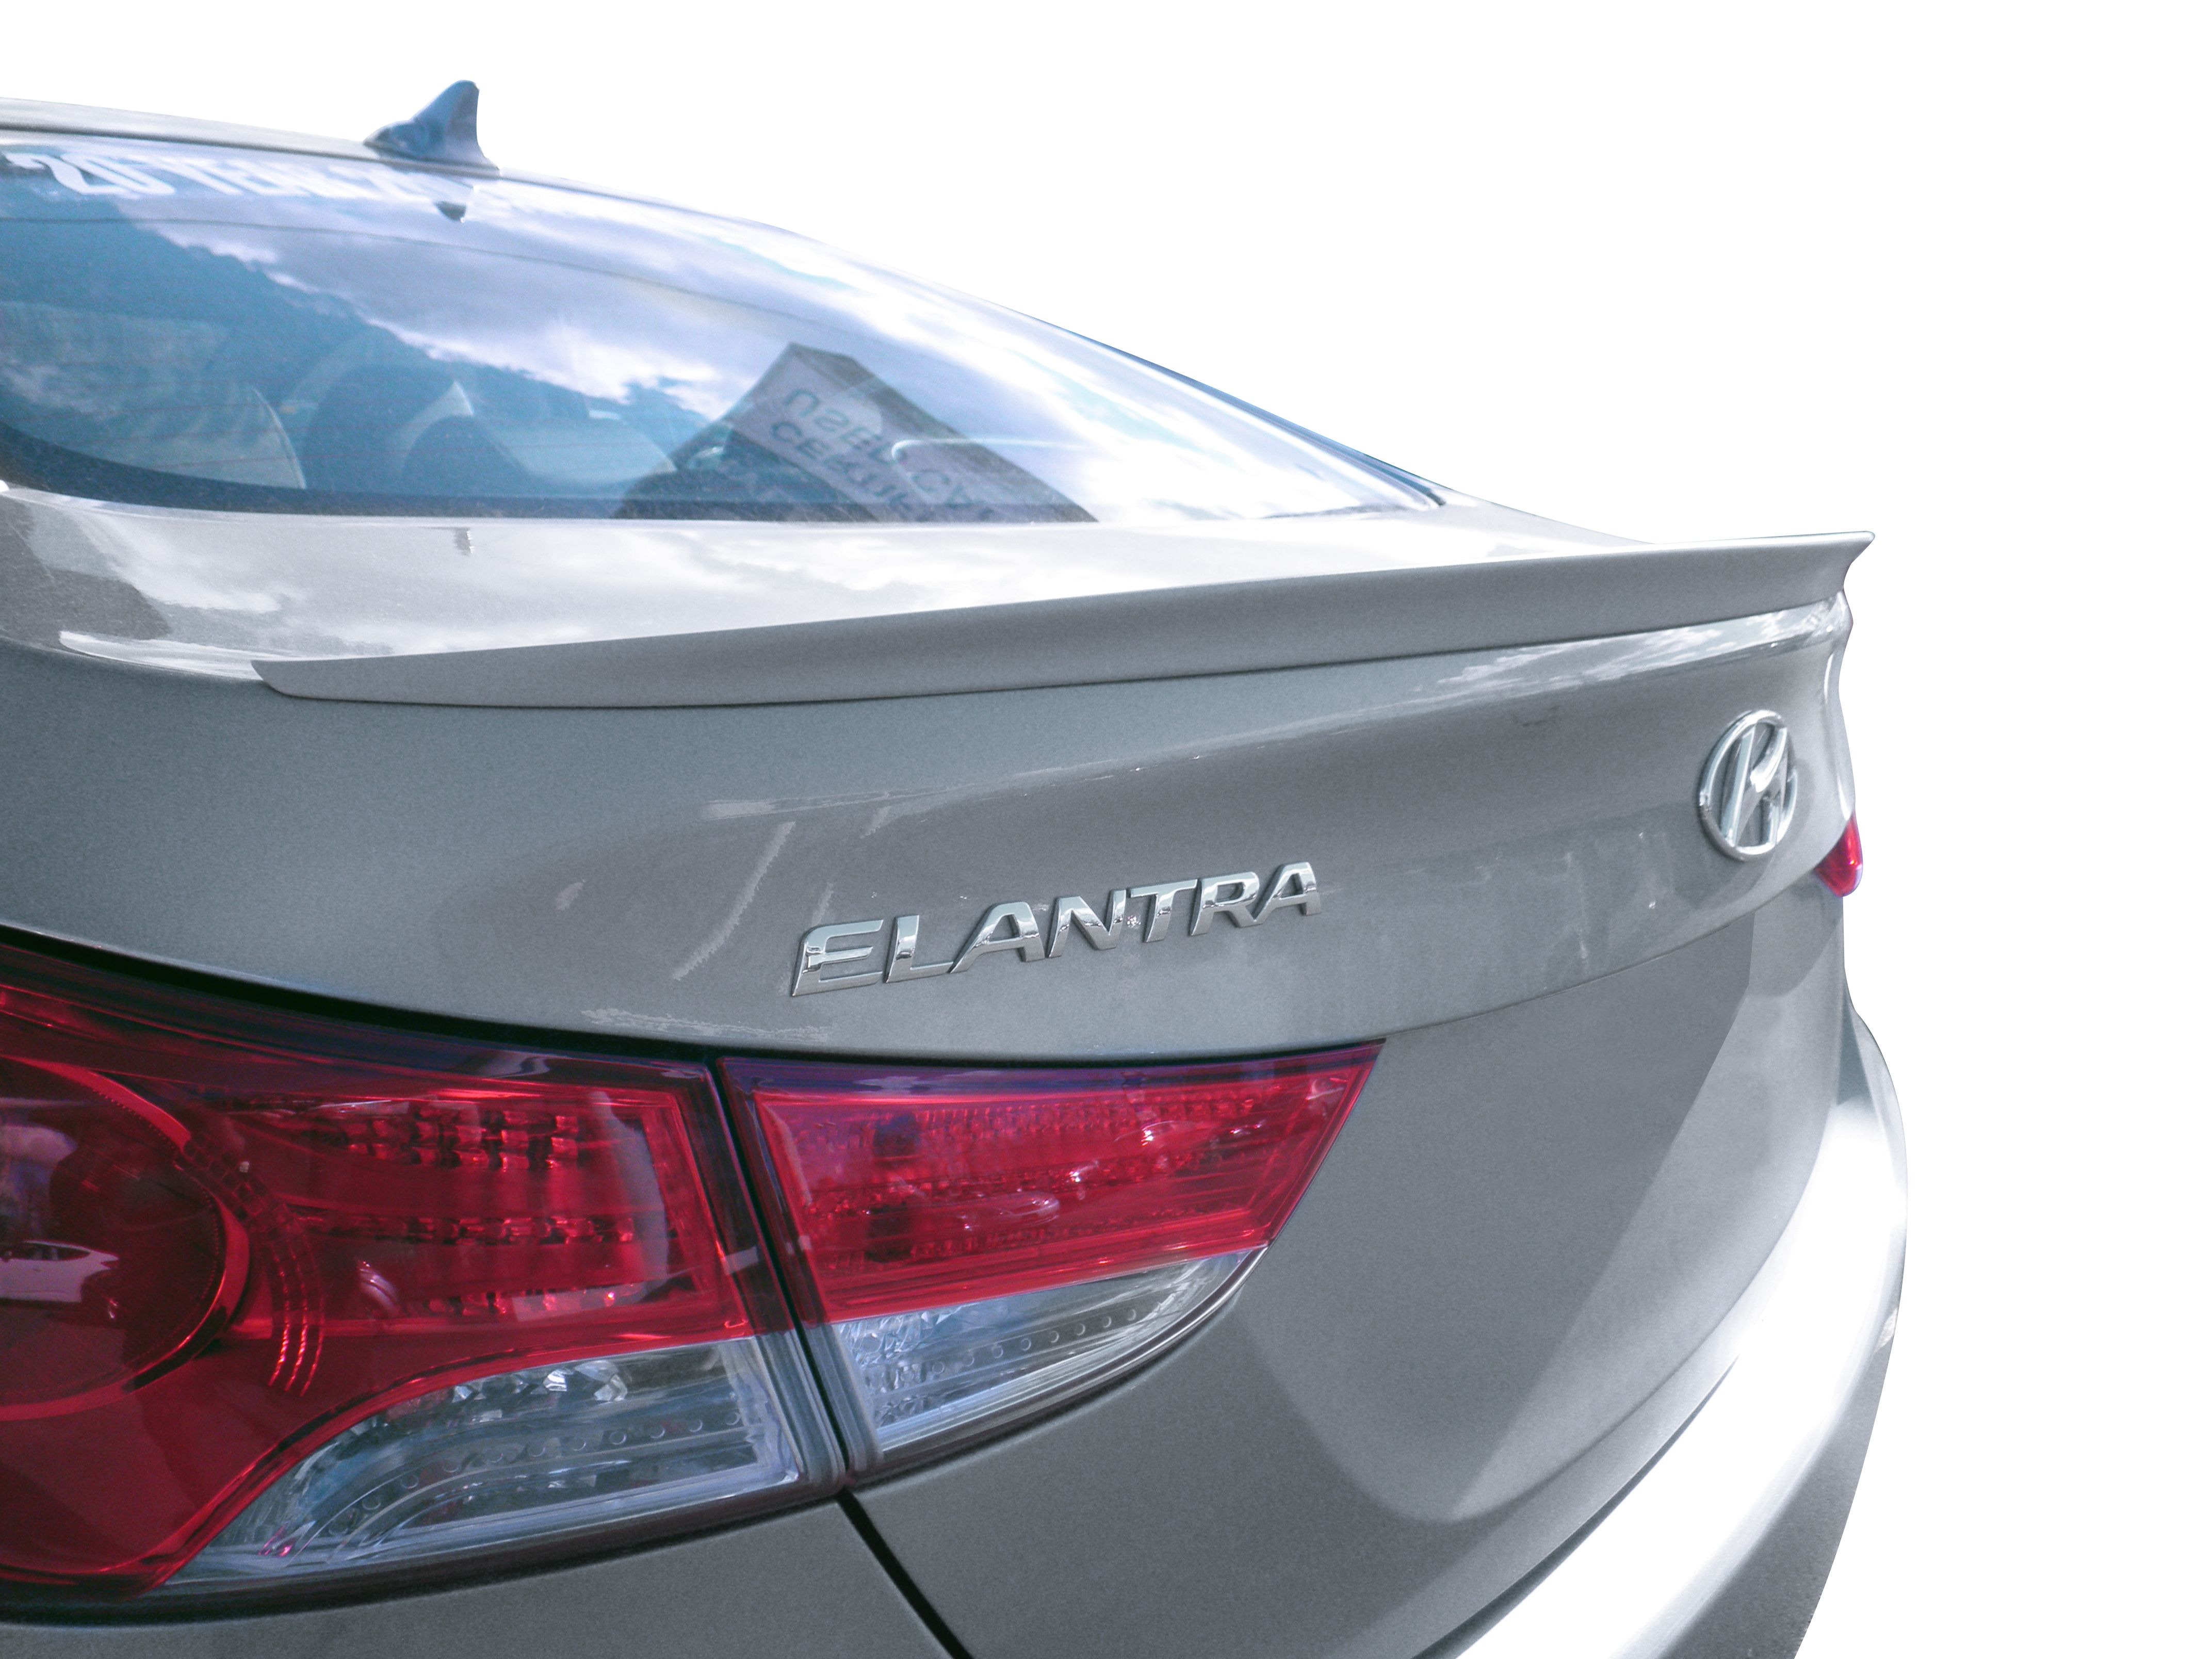 2011 2013 hyundai elantra custom style flush mount rear deck spoiler http